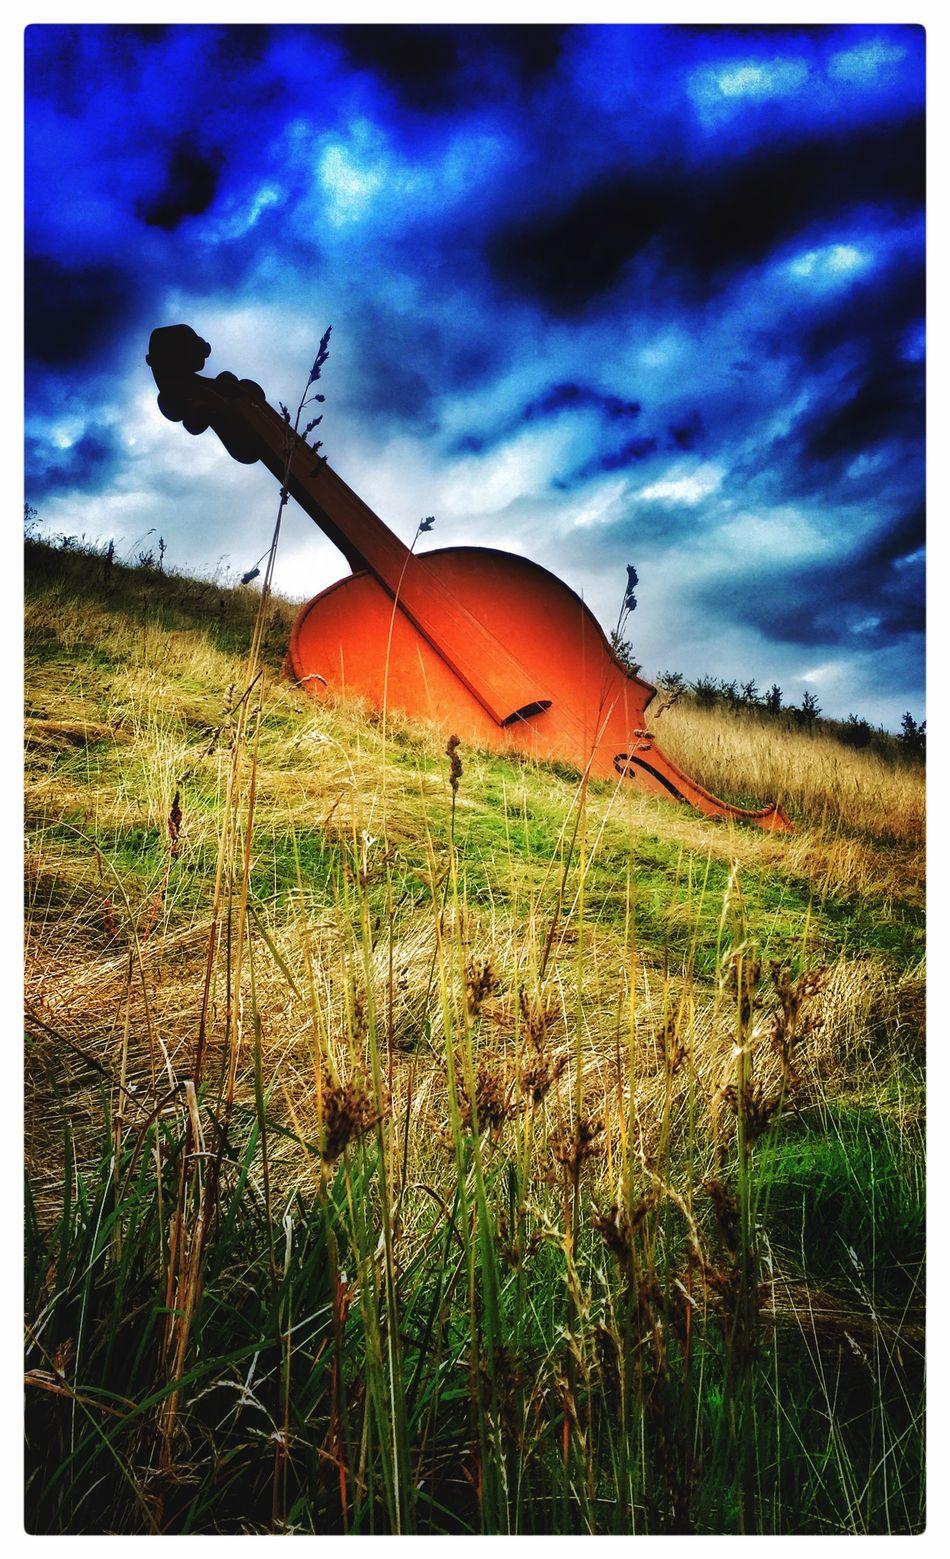 Buried Bass Landscapes Musical Instruments ArtWork